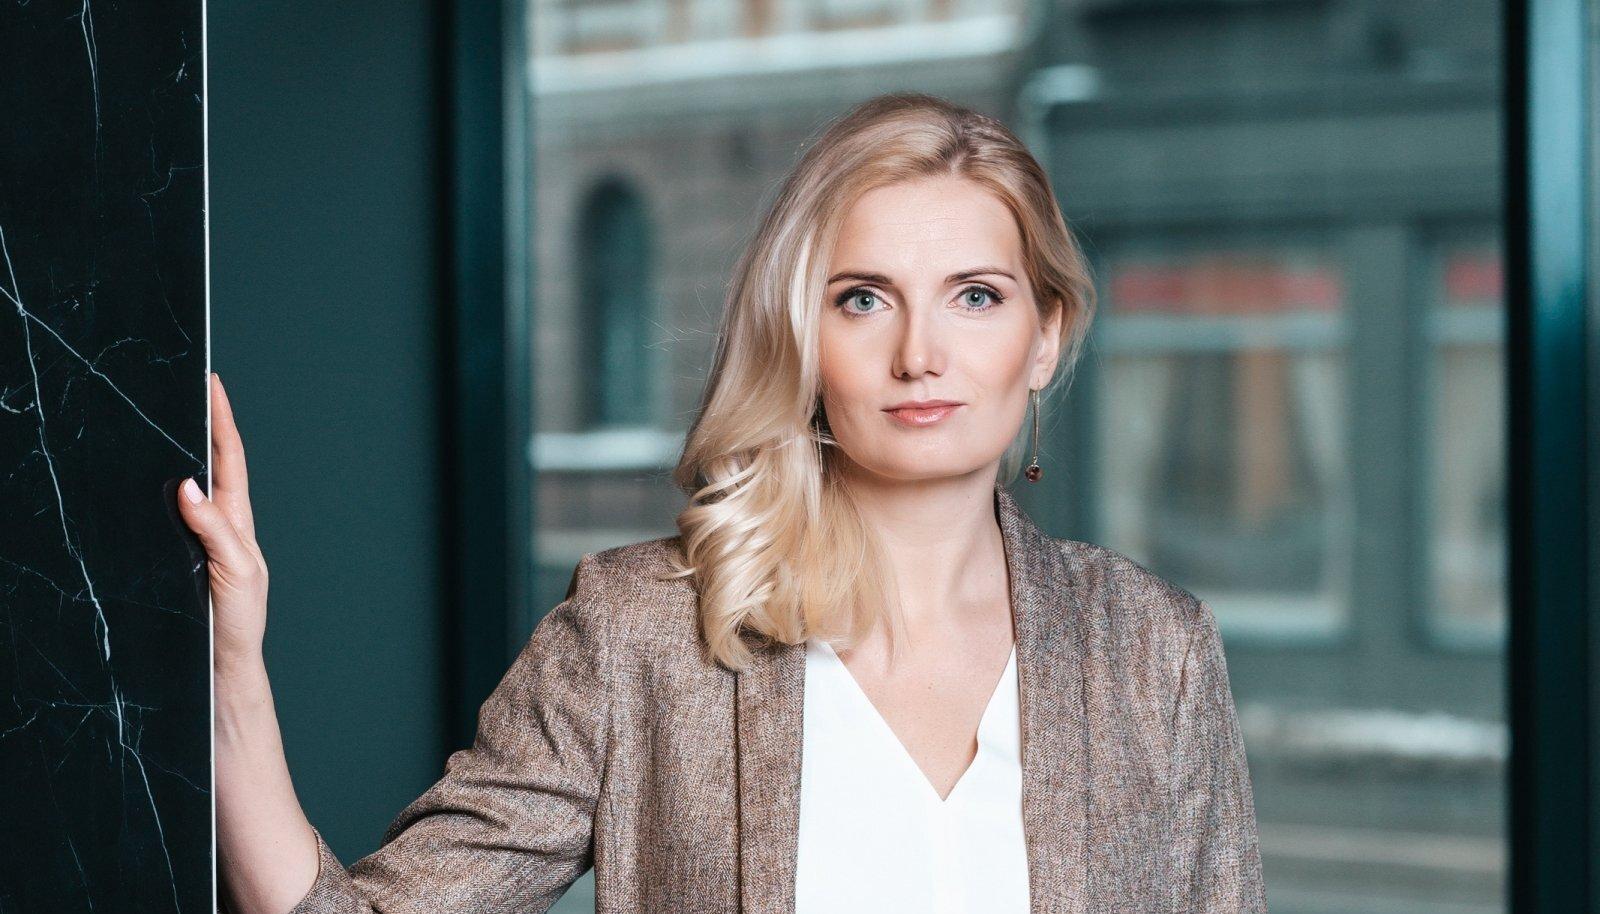 Foto: Anu Hammer | Jumestus: Reet Härmat